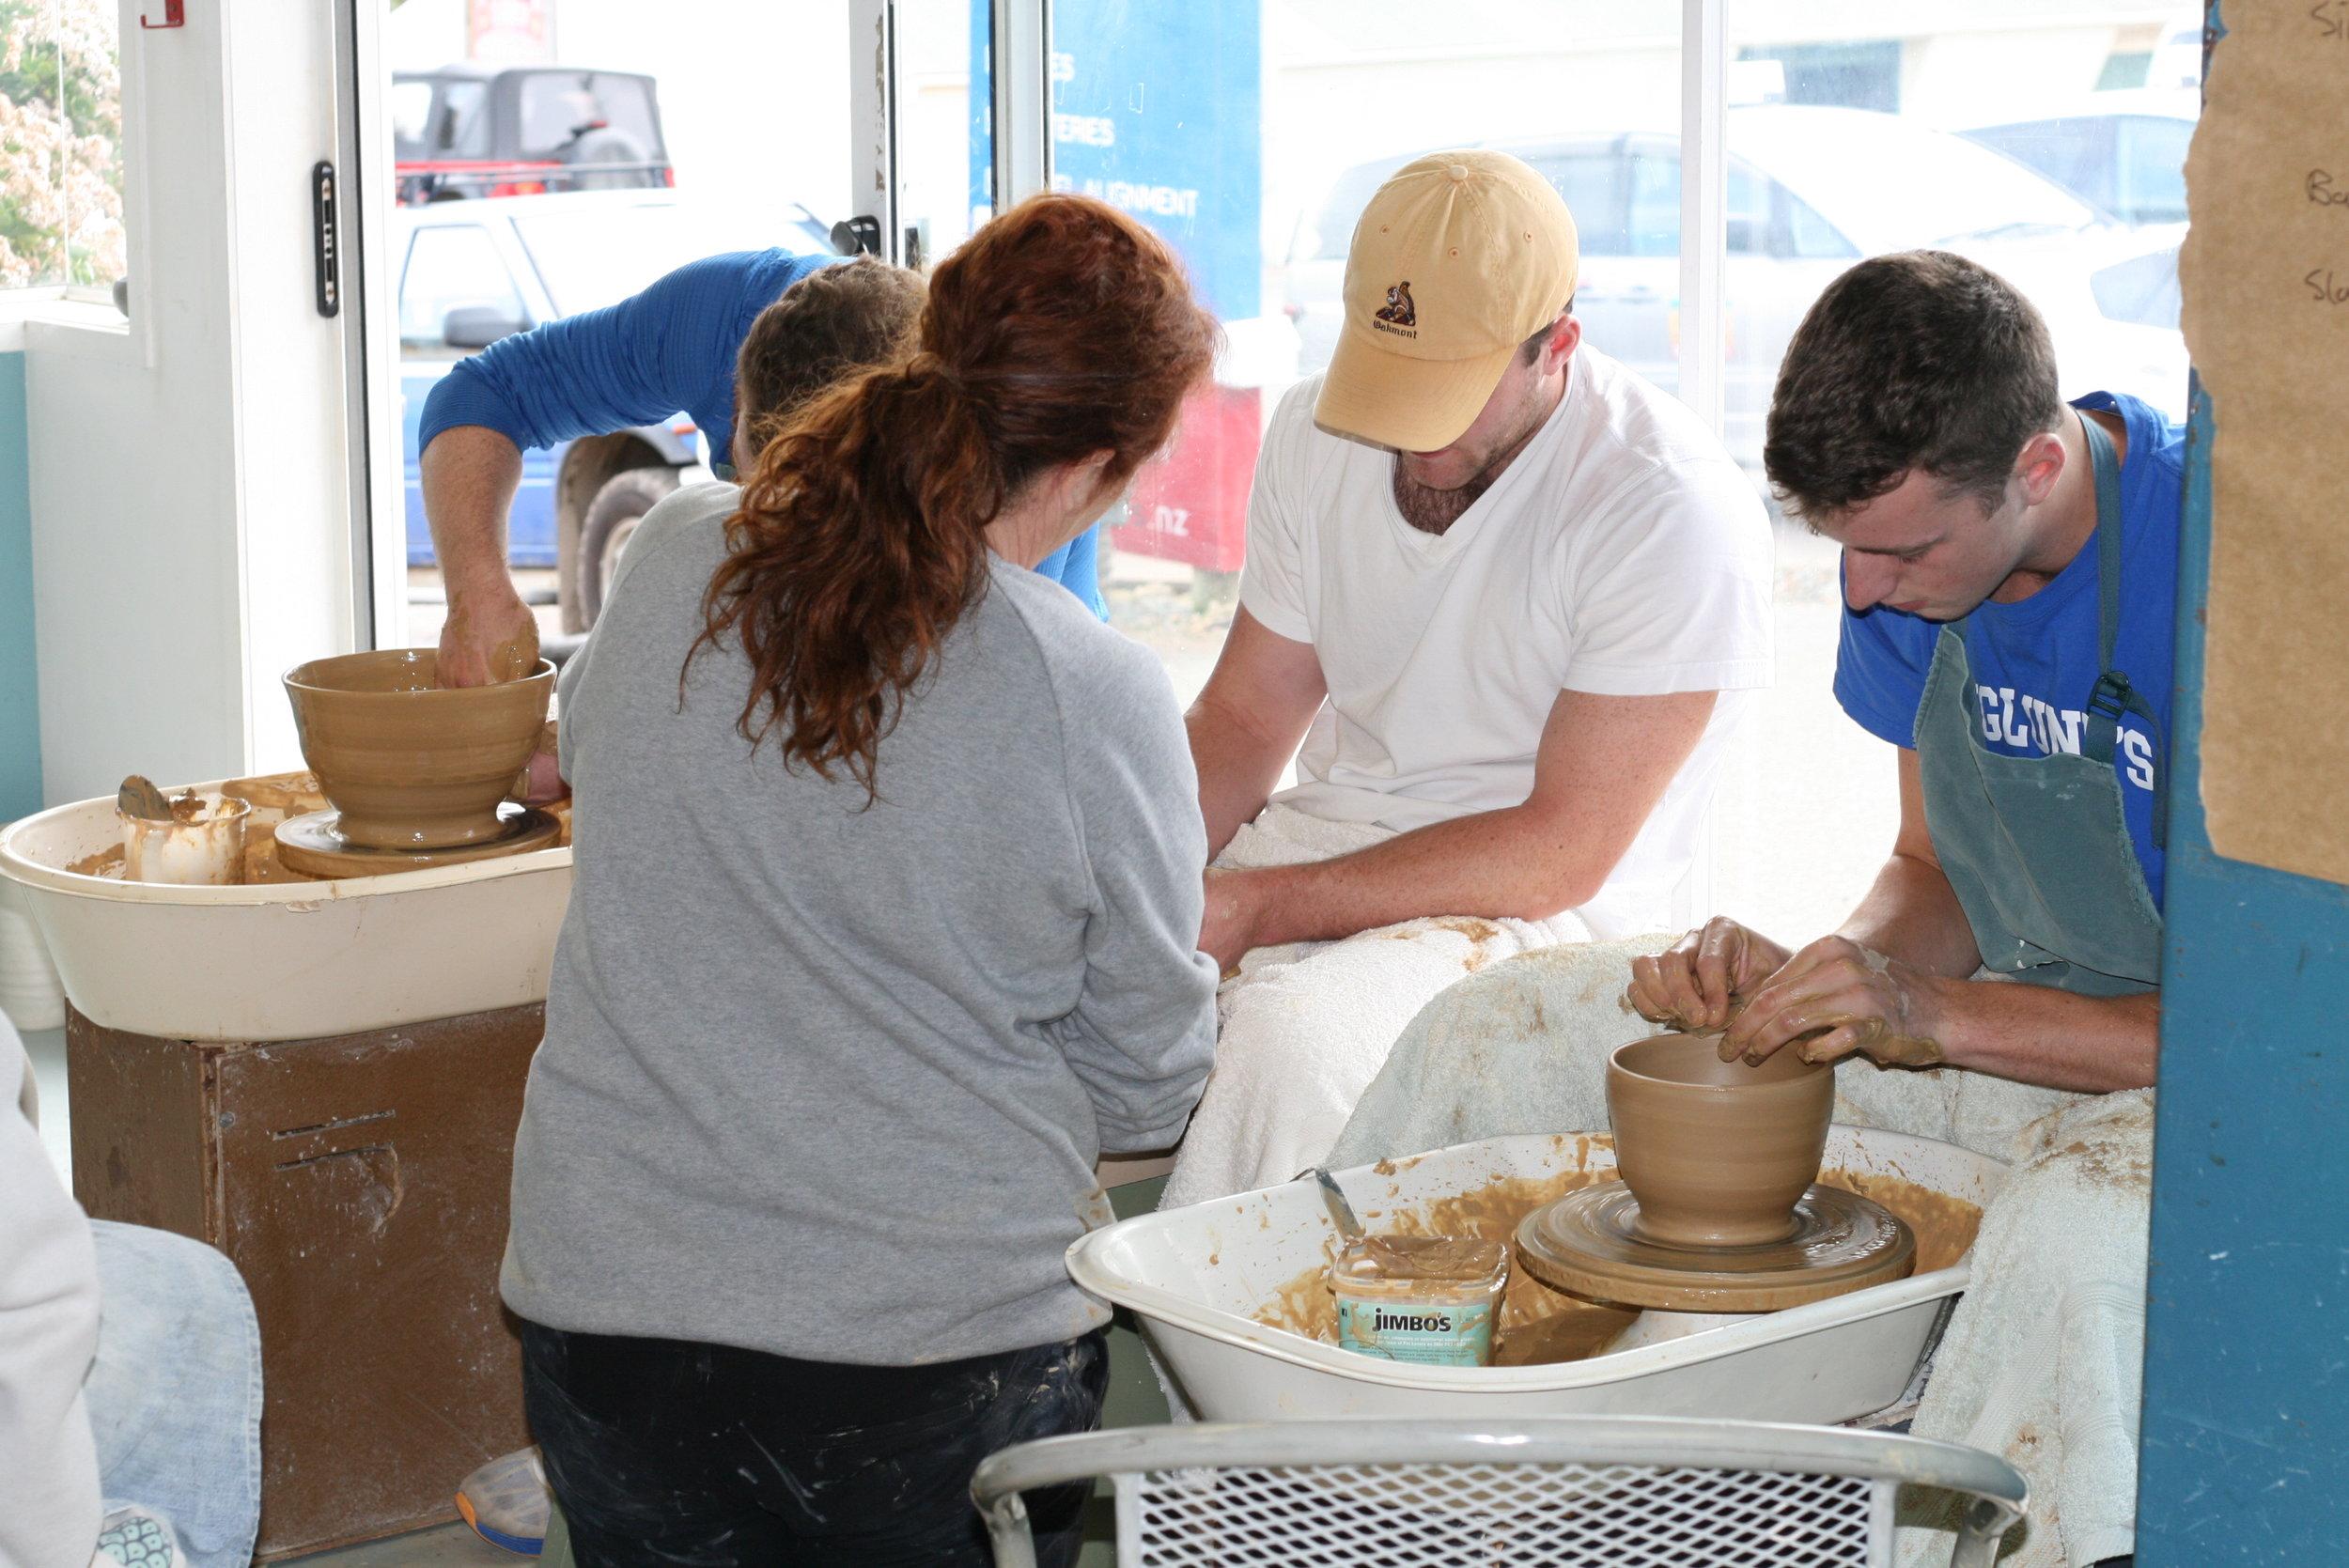 pottery-wheel-throwing-class.JPG